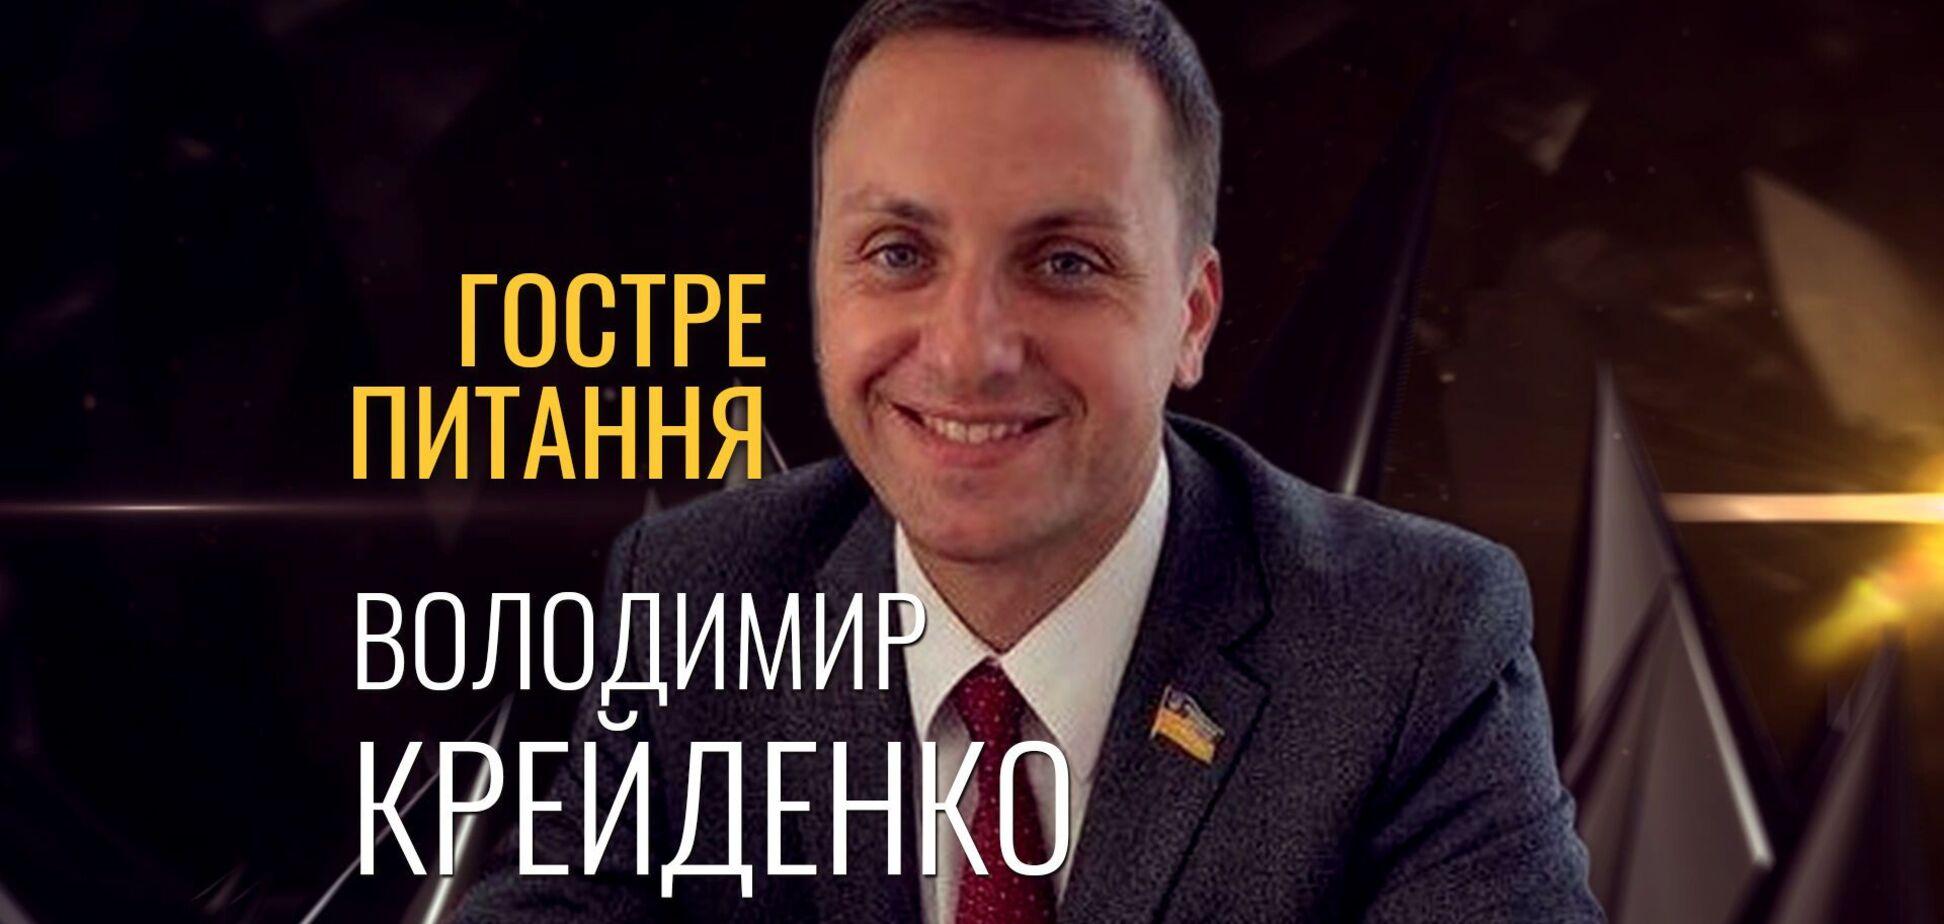 Володимир Крейденко 📍 Гостре питання